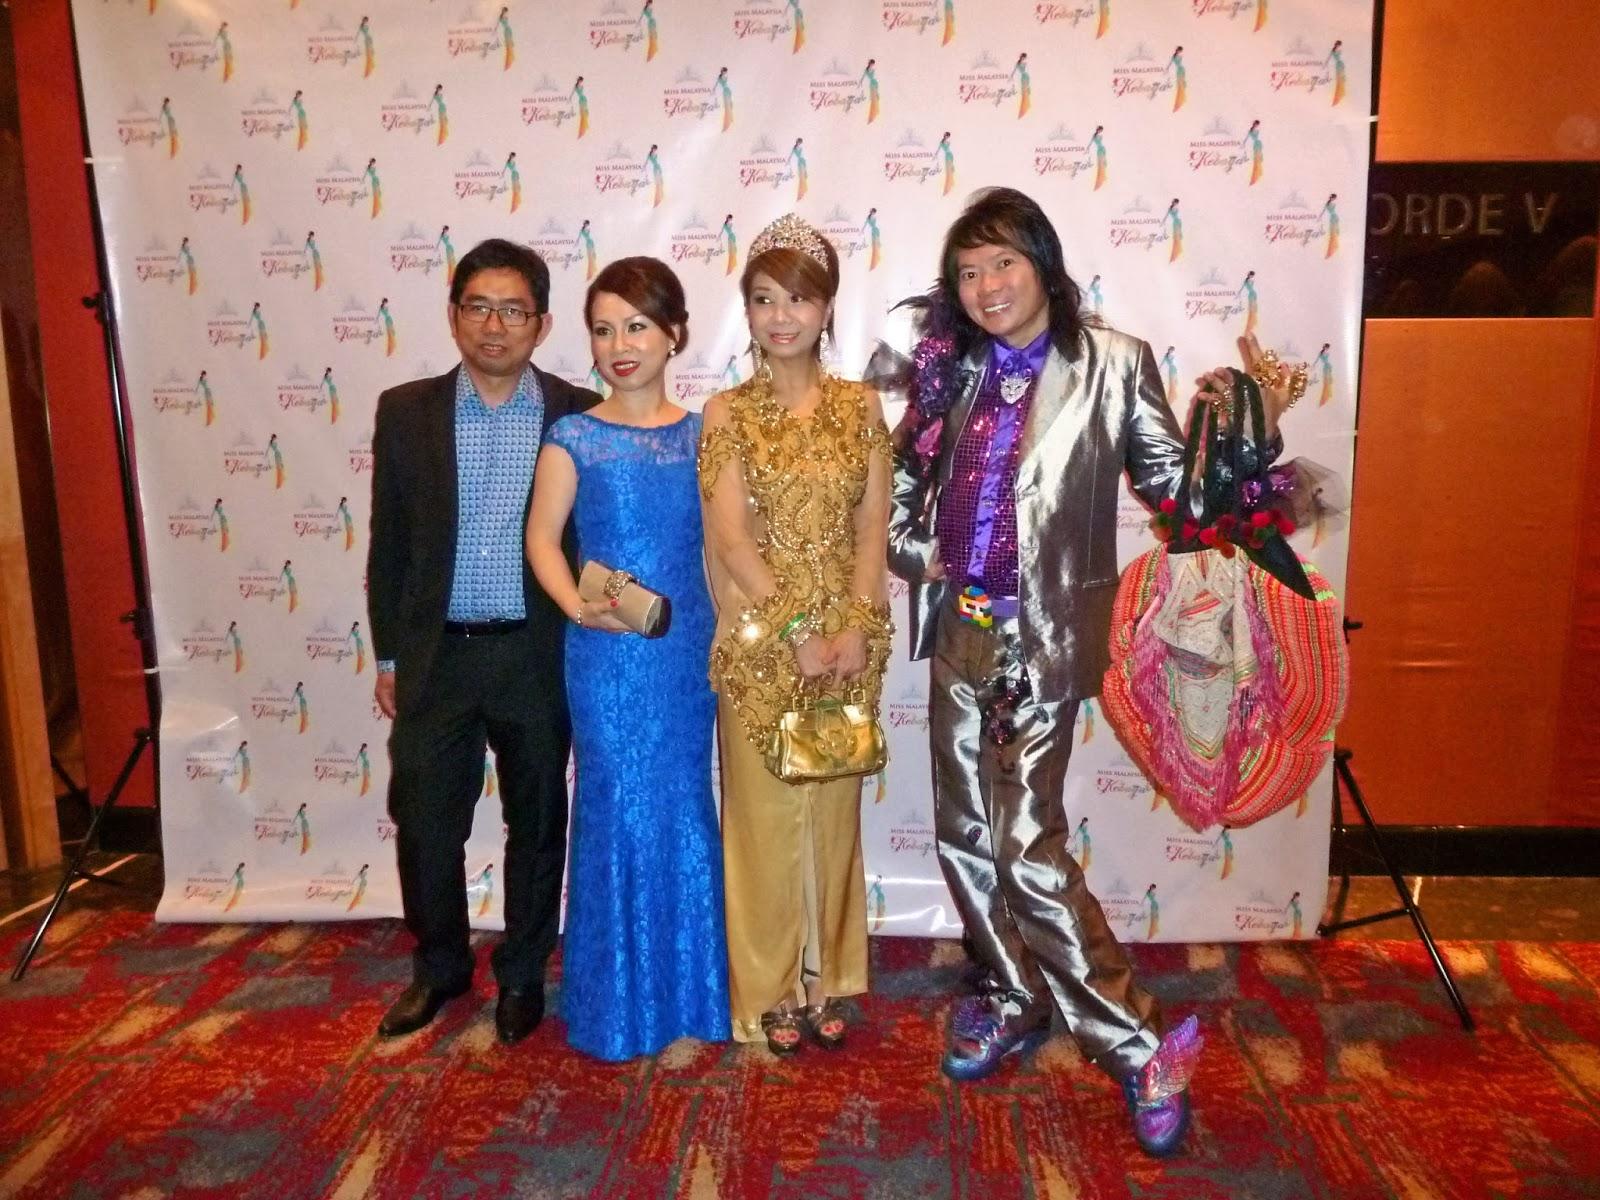 CHRISTOPHER LIM, JENNIFER ONG WHO WAS AWARDED MISS MALAYSIA KEBAYA ...